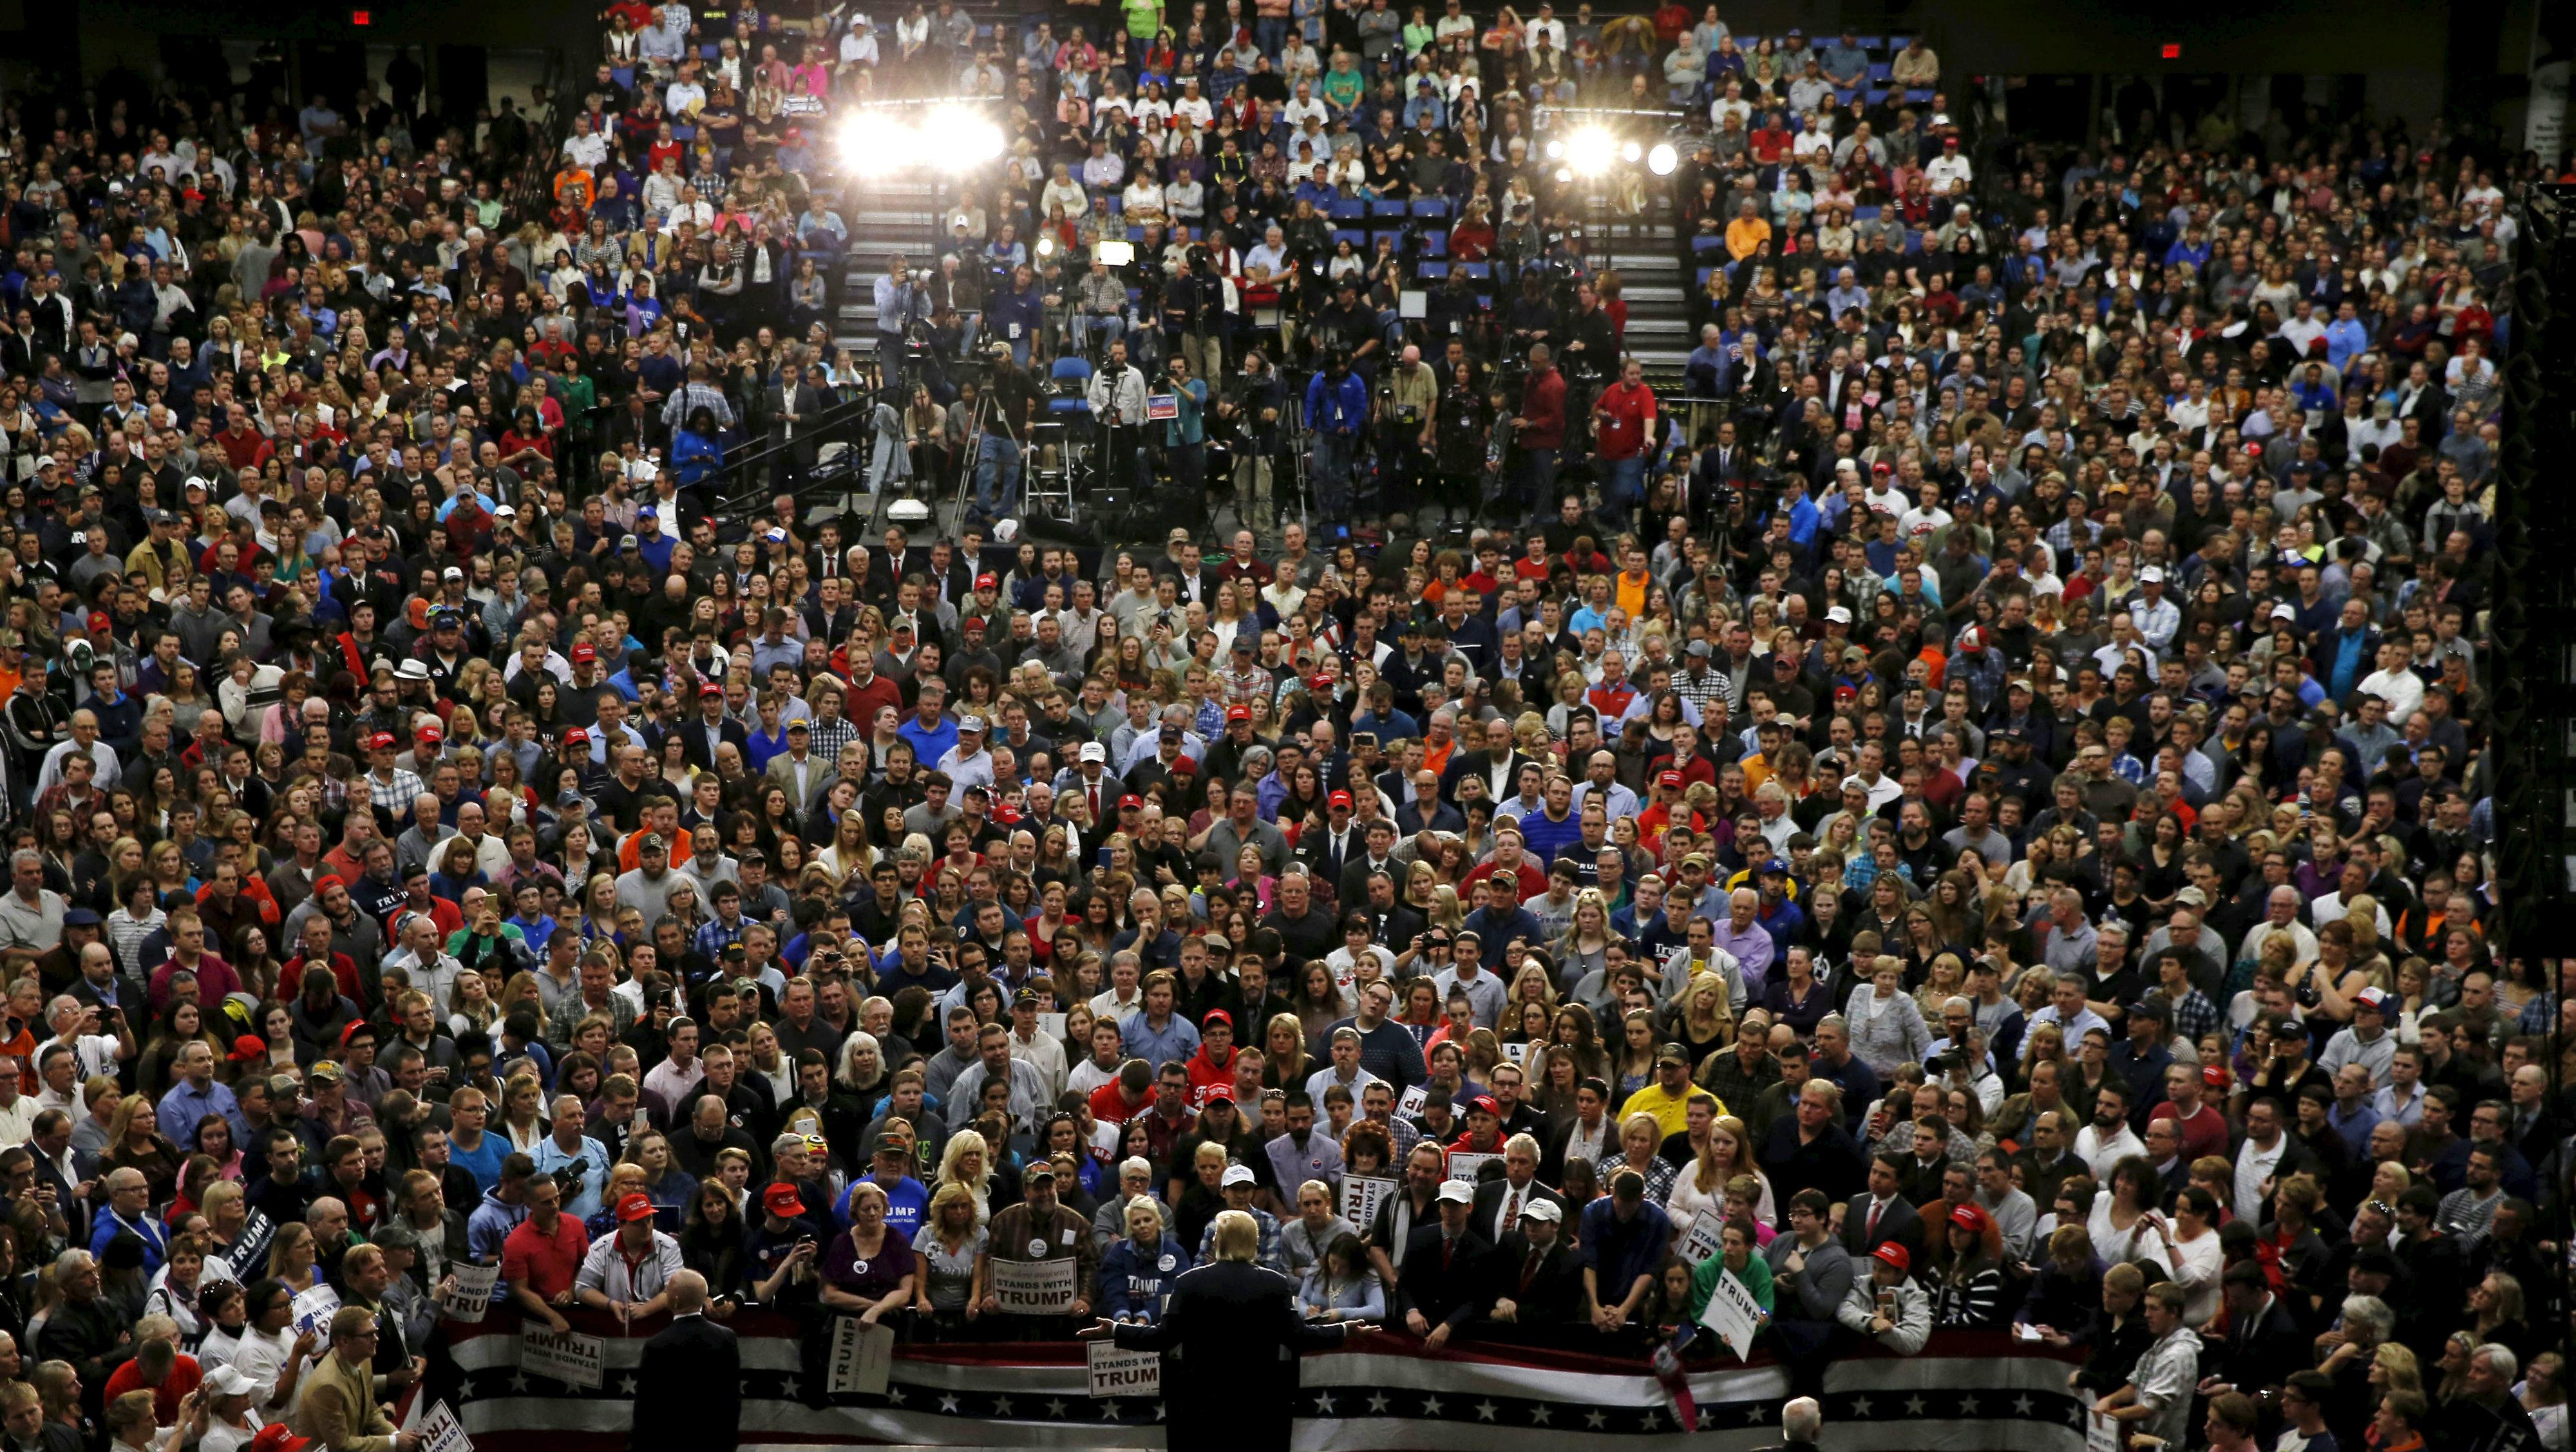 U.S. Republican presidential candidate Trump speaks at a campaign event in Springfield.